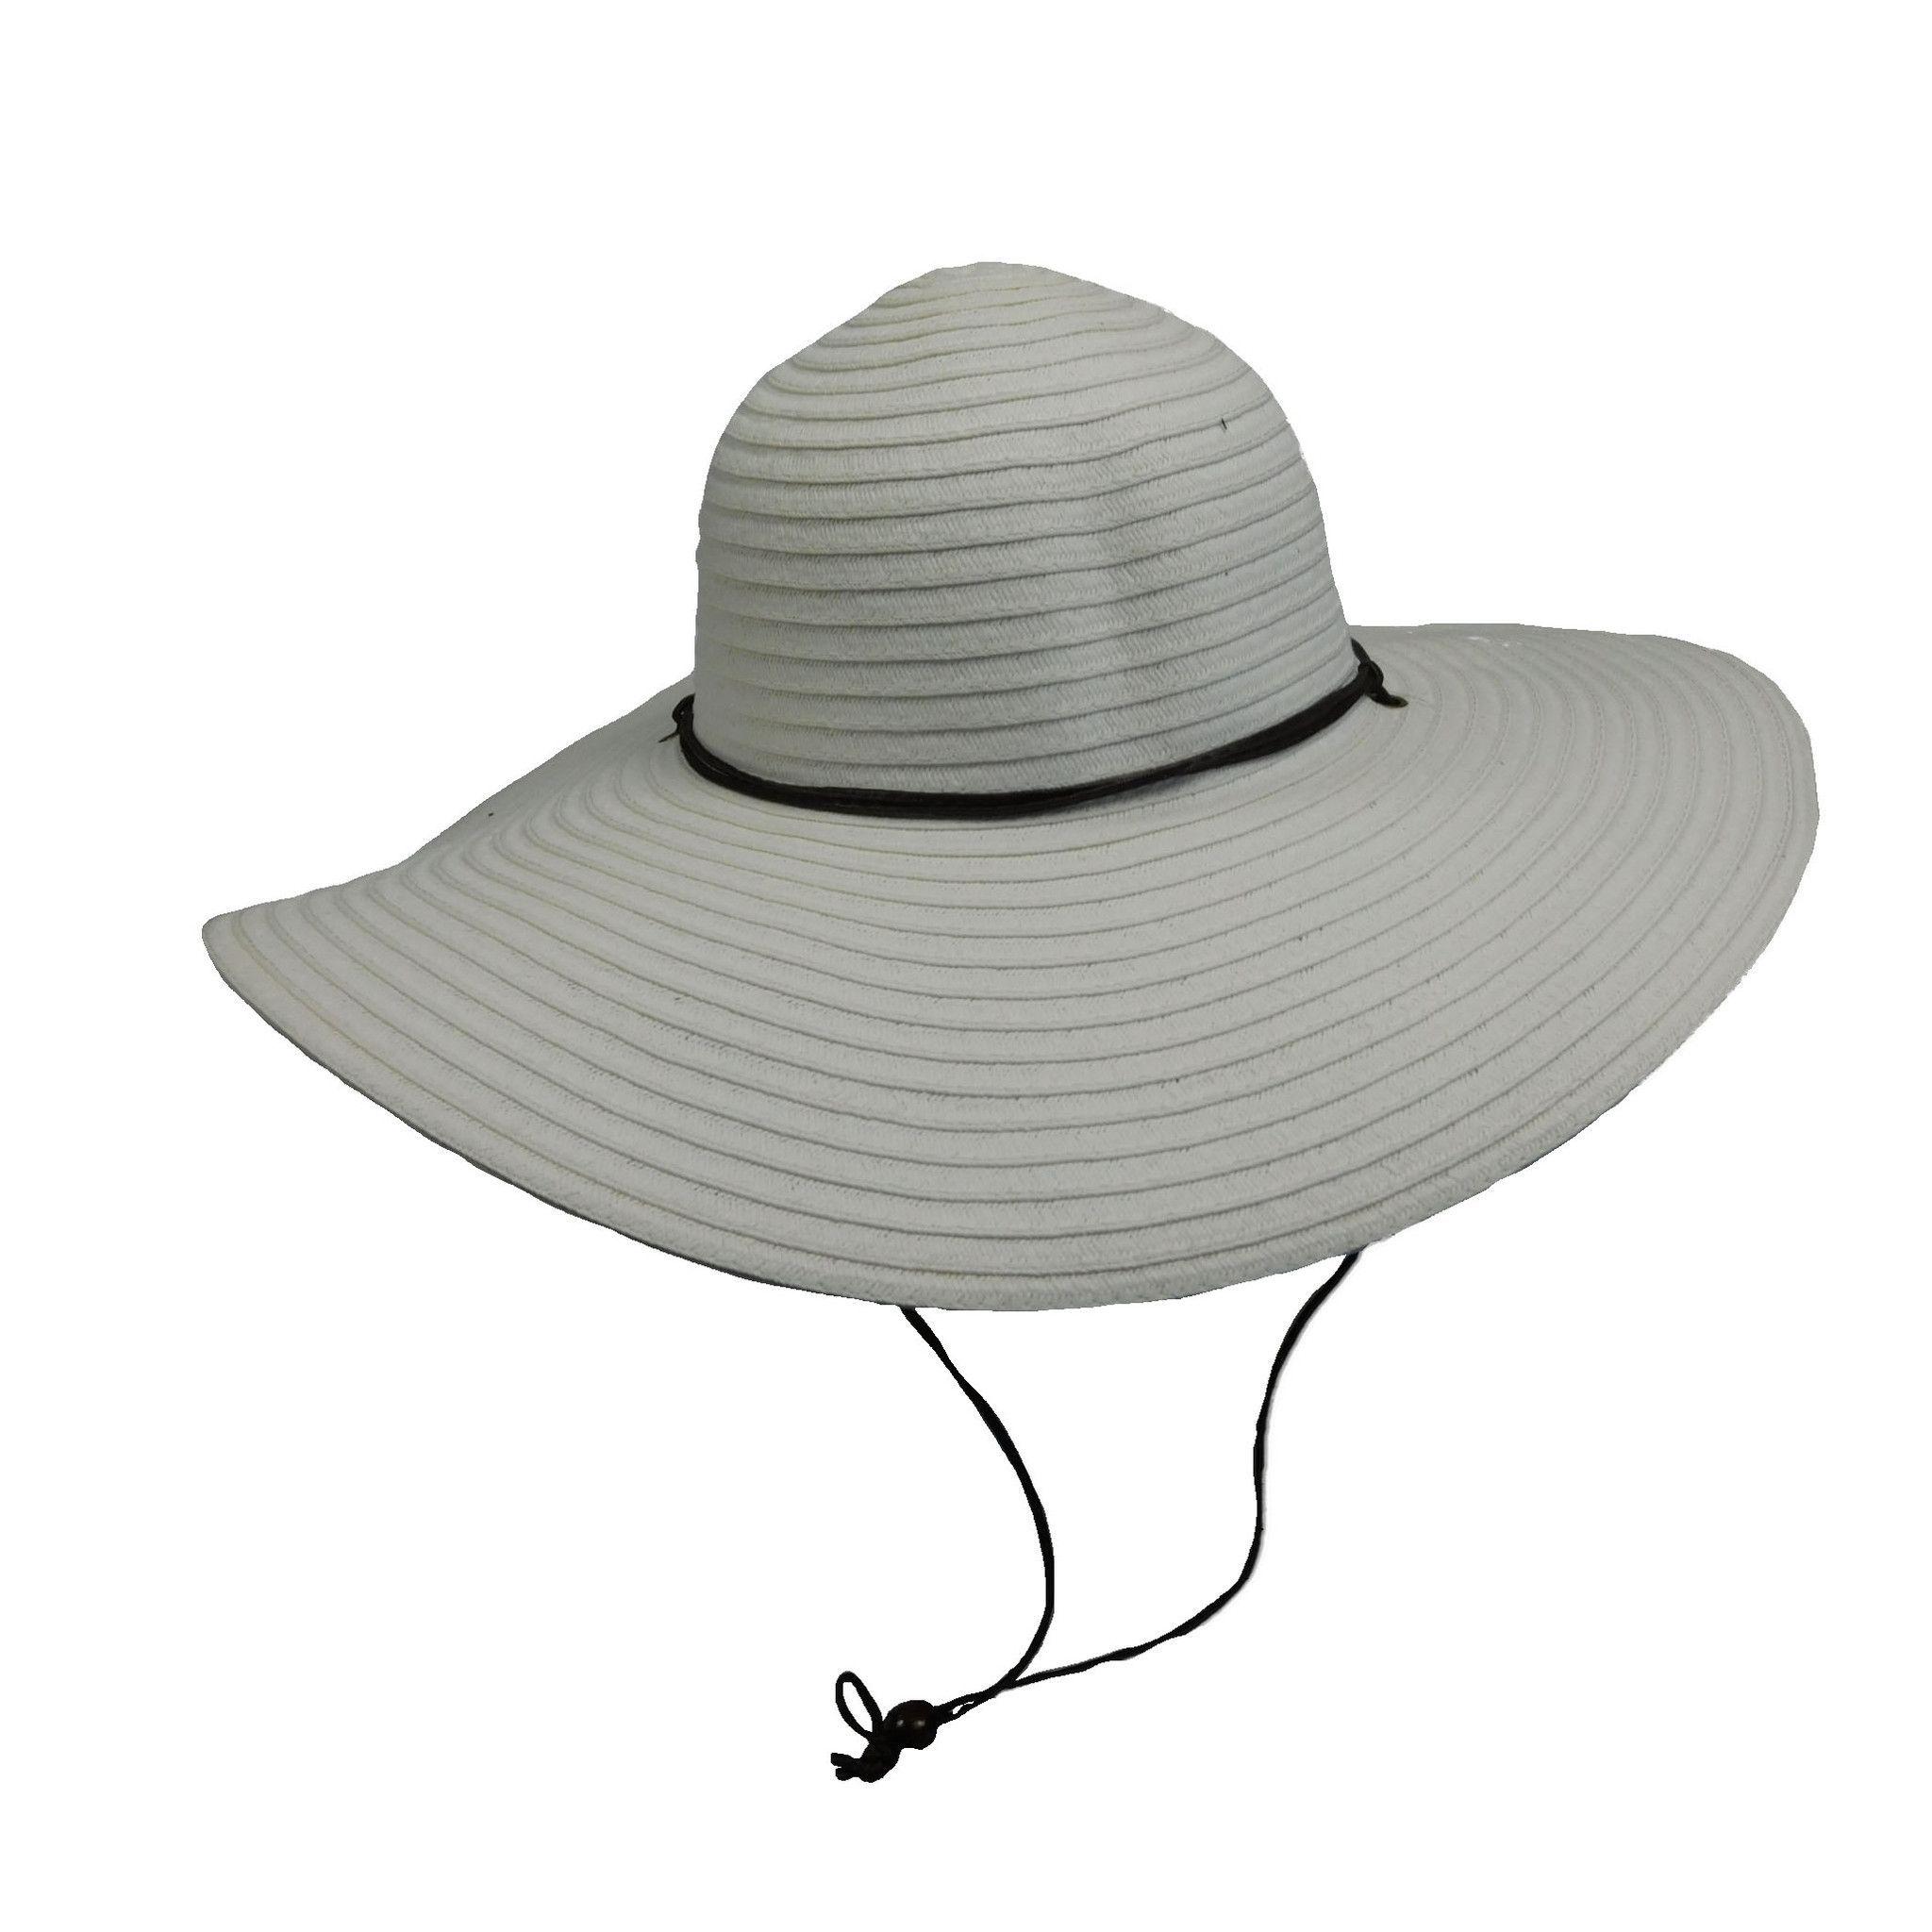 844cd06d1ea40 Tropical Trends Toyo Floppy Hat